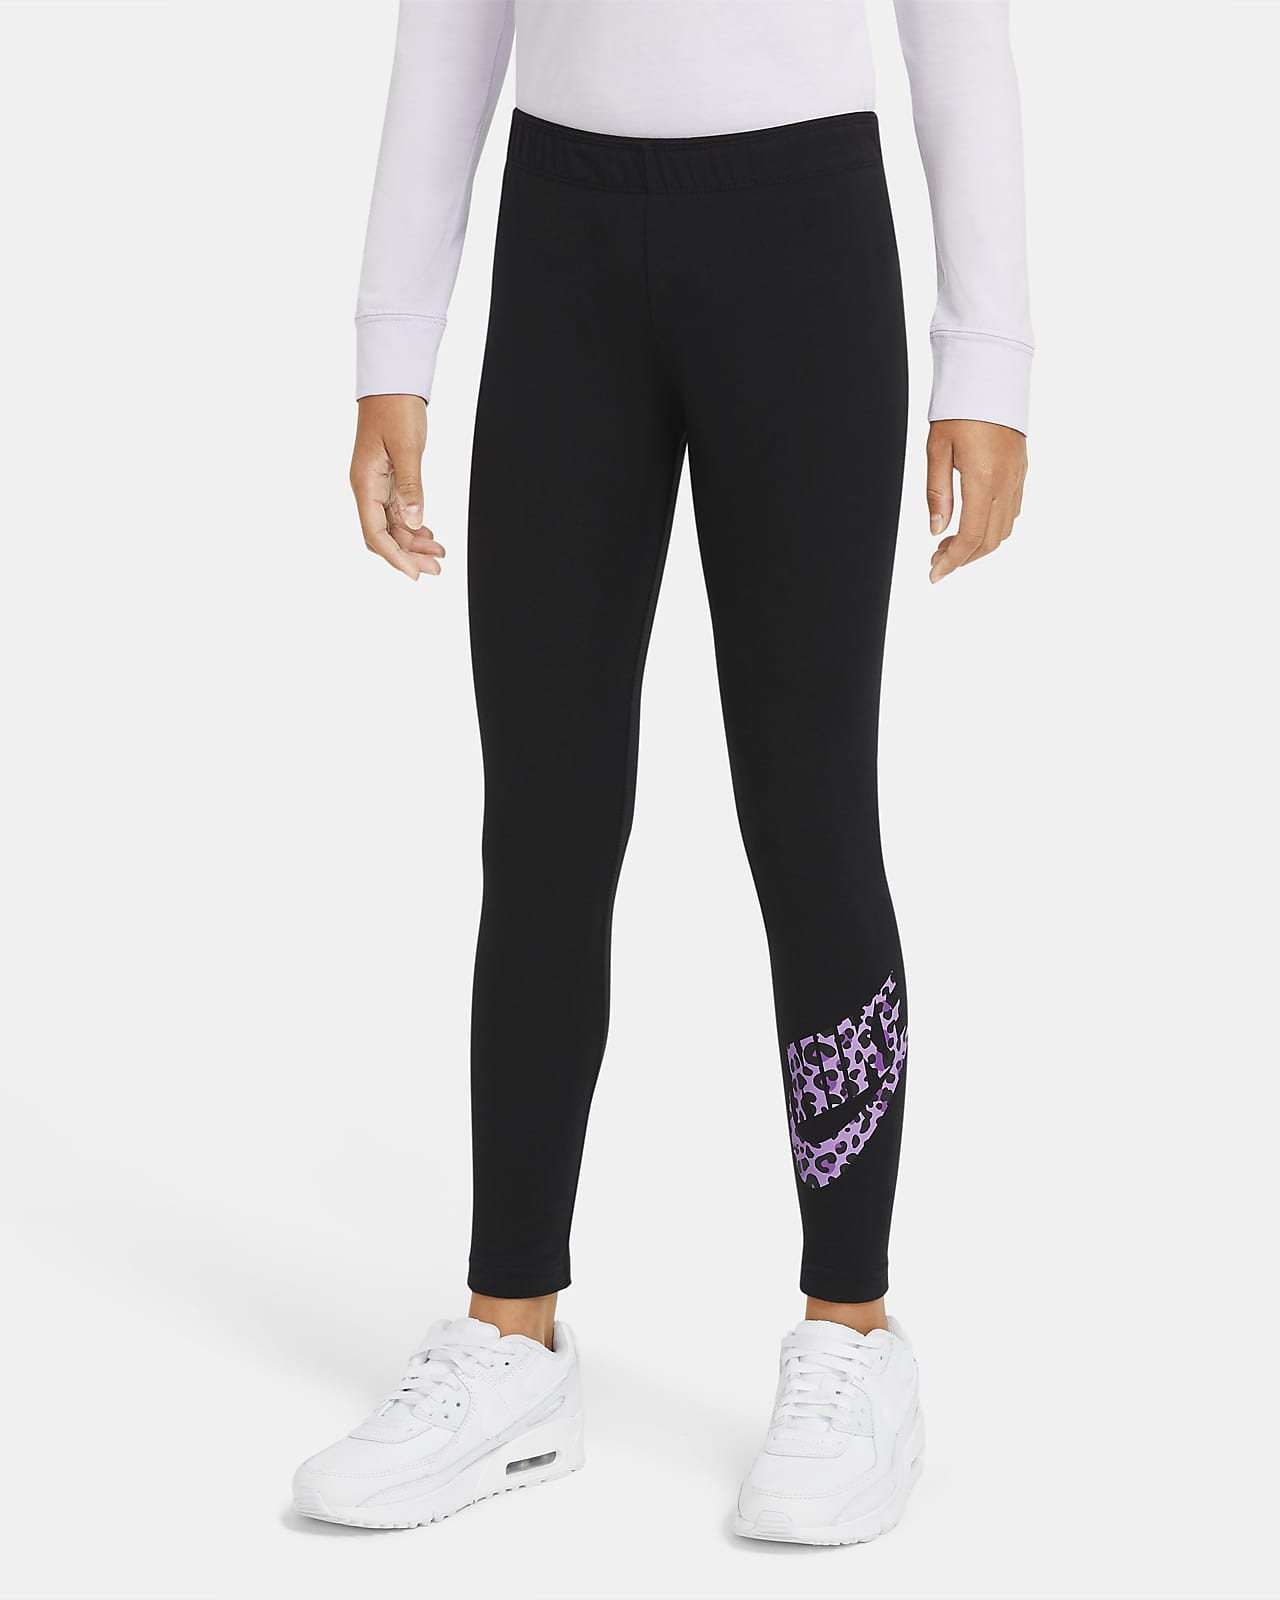 Leggings Nike Sportswear Júnior (Rapariga)